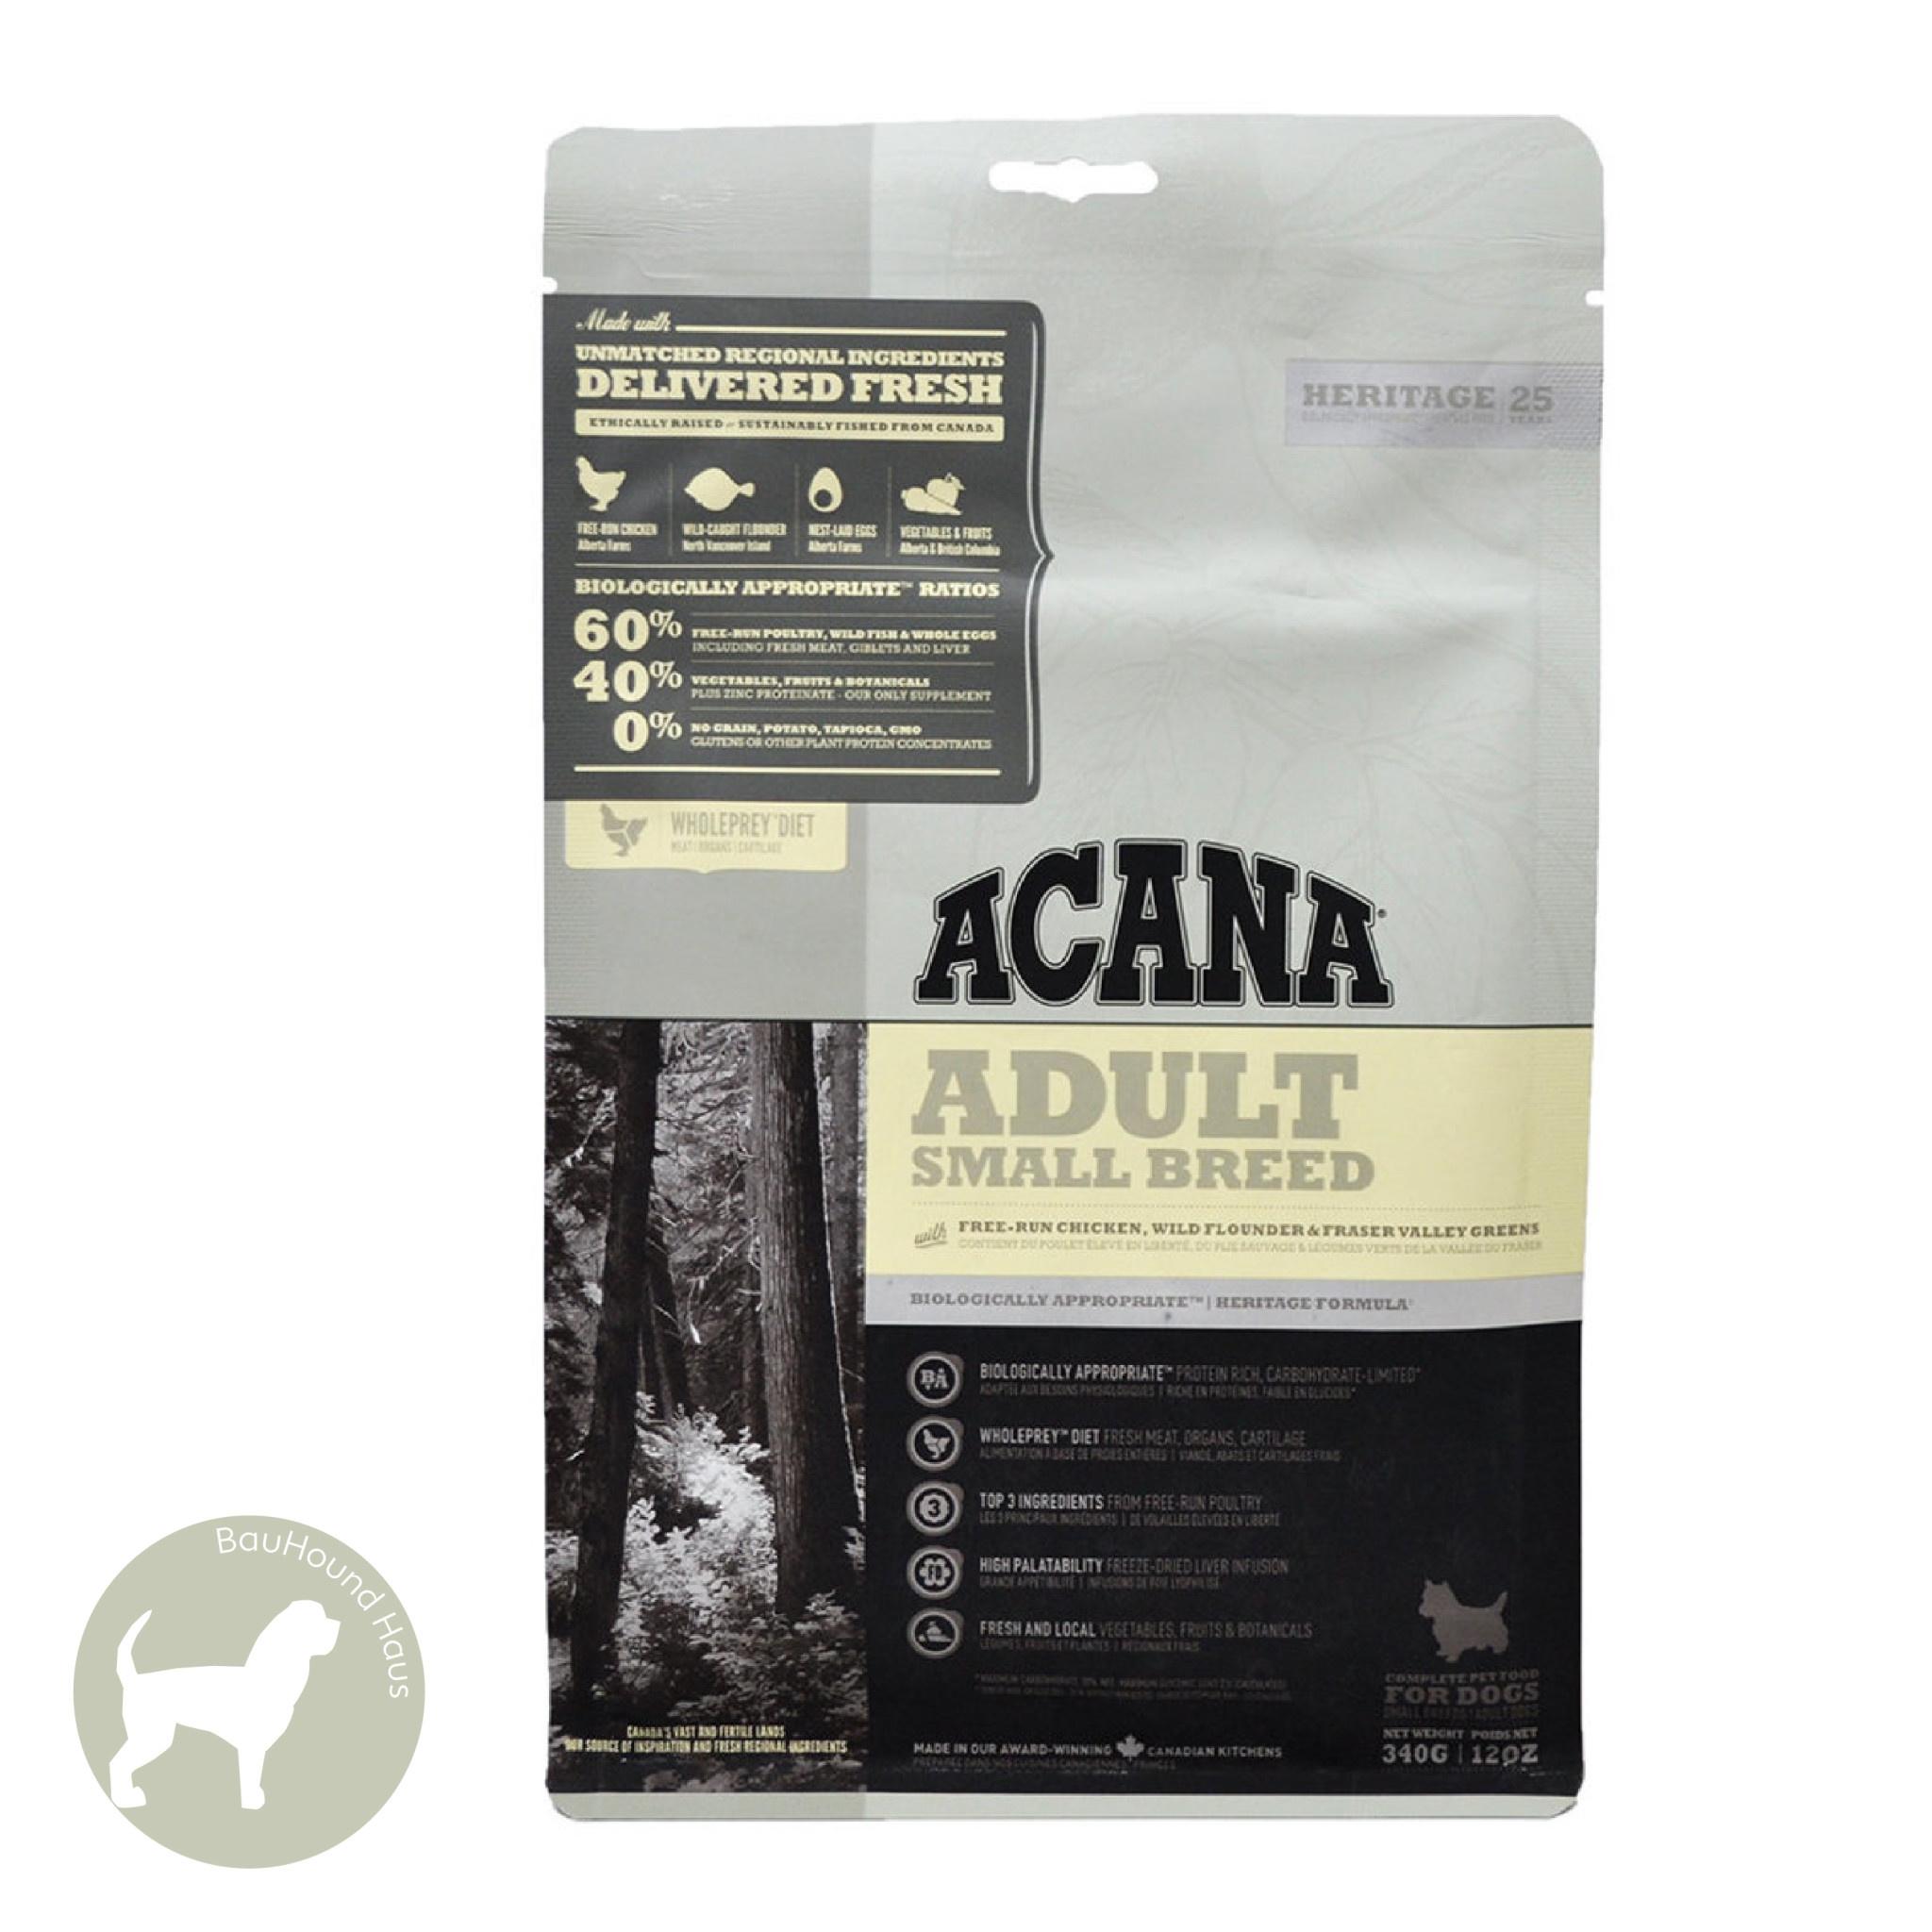 Acana Acana HERITAGE Small Breed Adult Kibble, 2kg